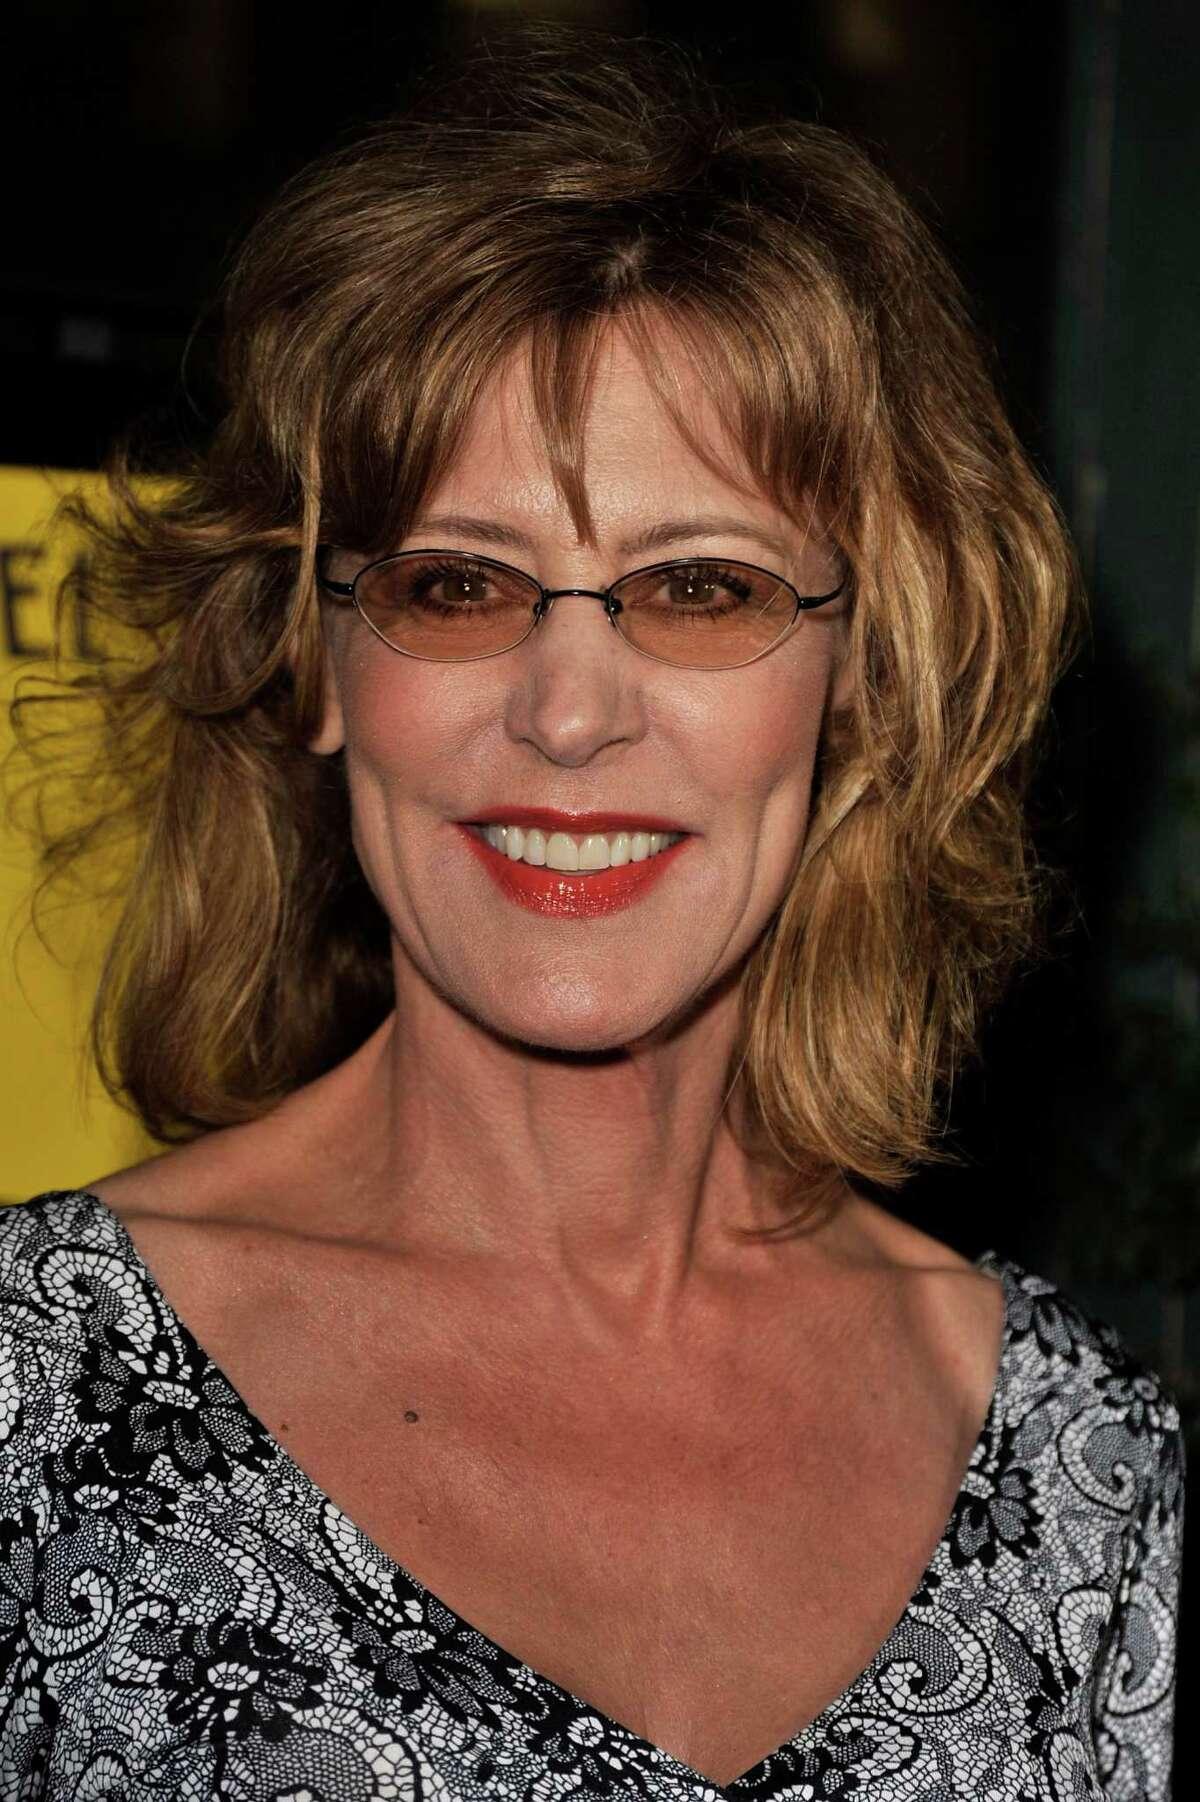 BEVERLY HILLS, CA - SEPTEMBER 15: Actress Christine Lahti arrives at Overture Films' LA Premiere of